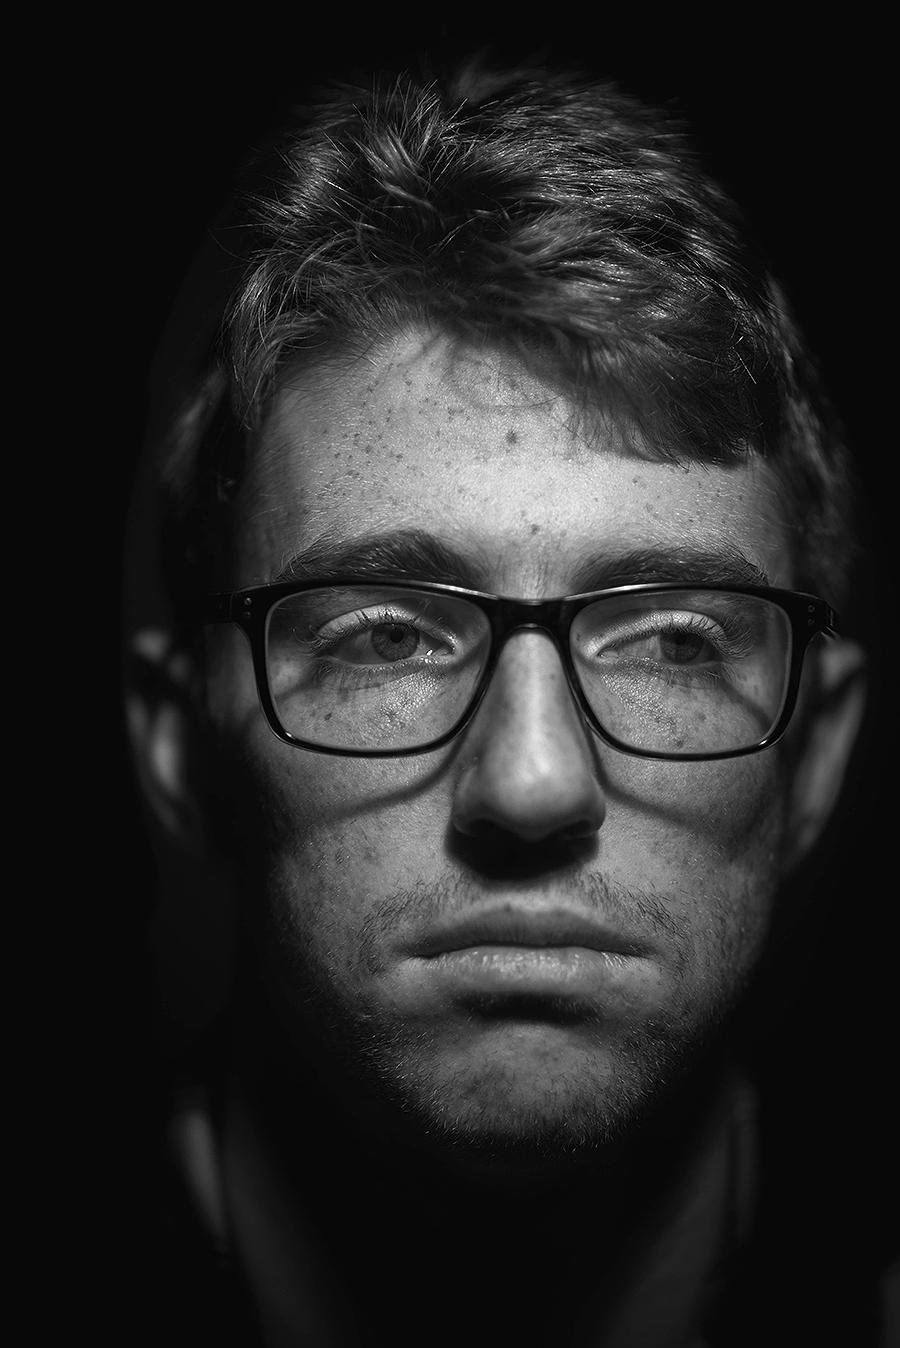 Colin_Sadness_photography_model_photo_emotion_portrait_headshot_kaleb_germinaro